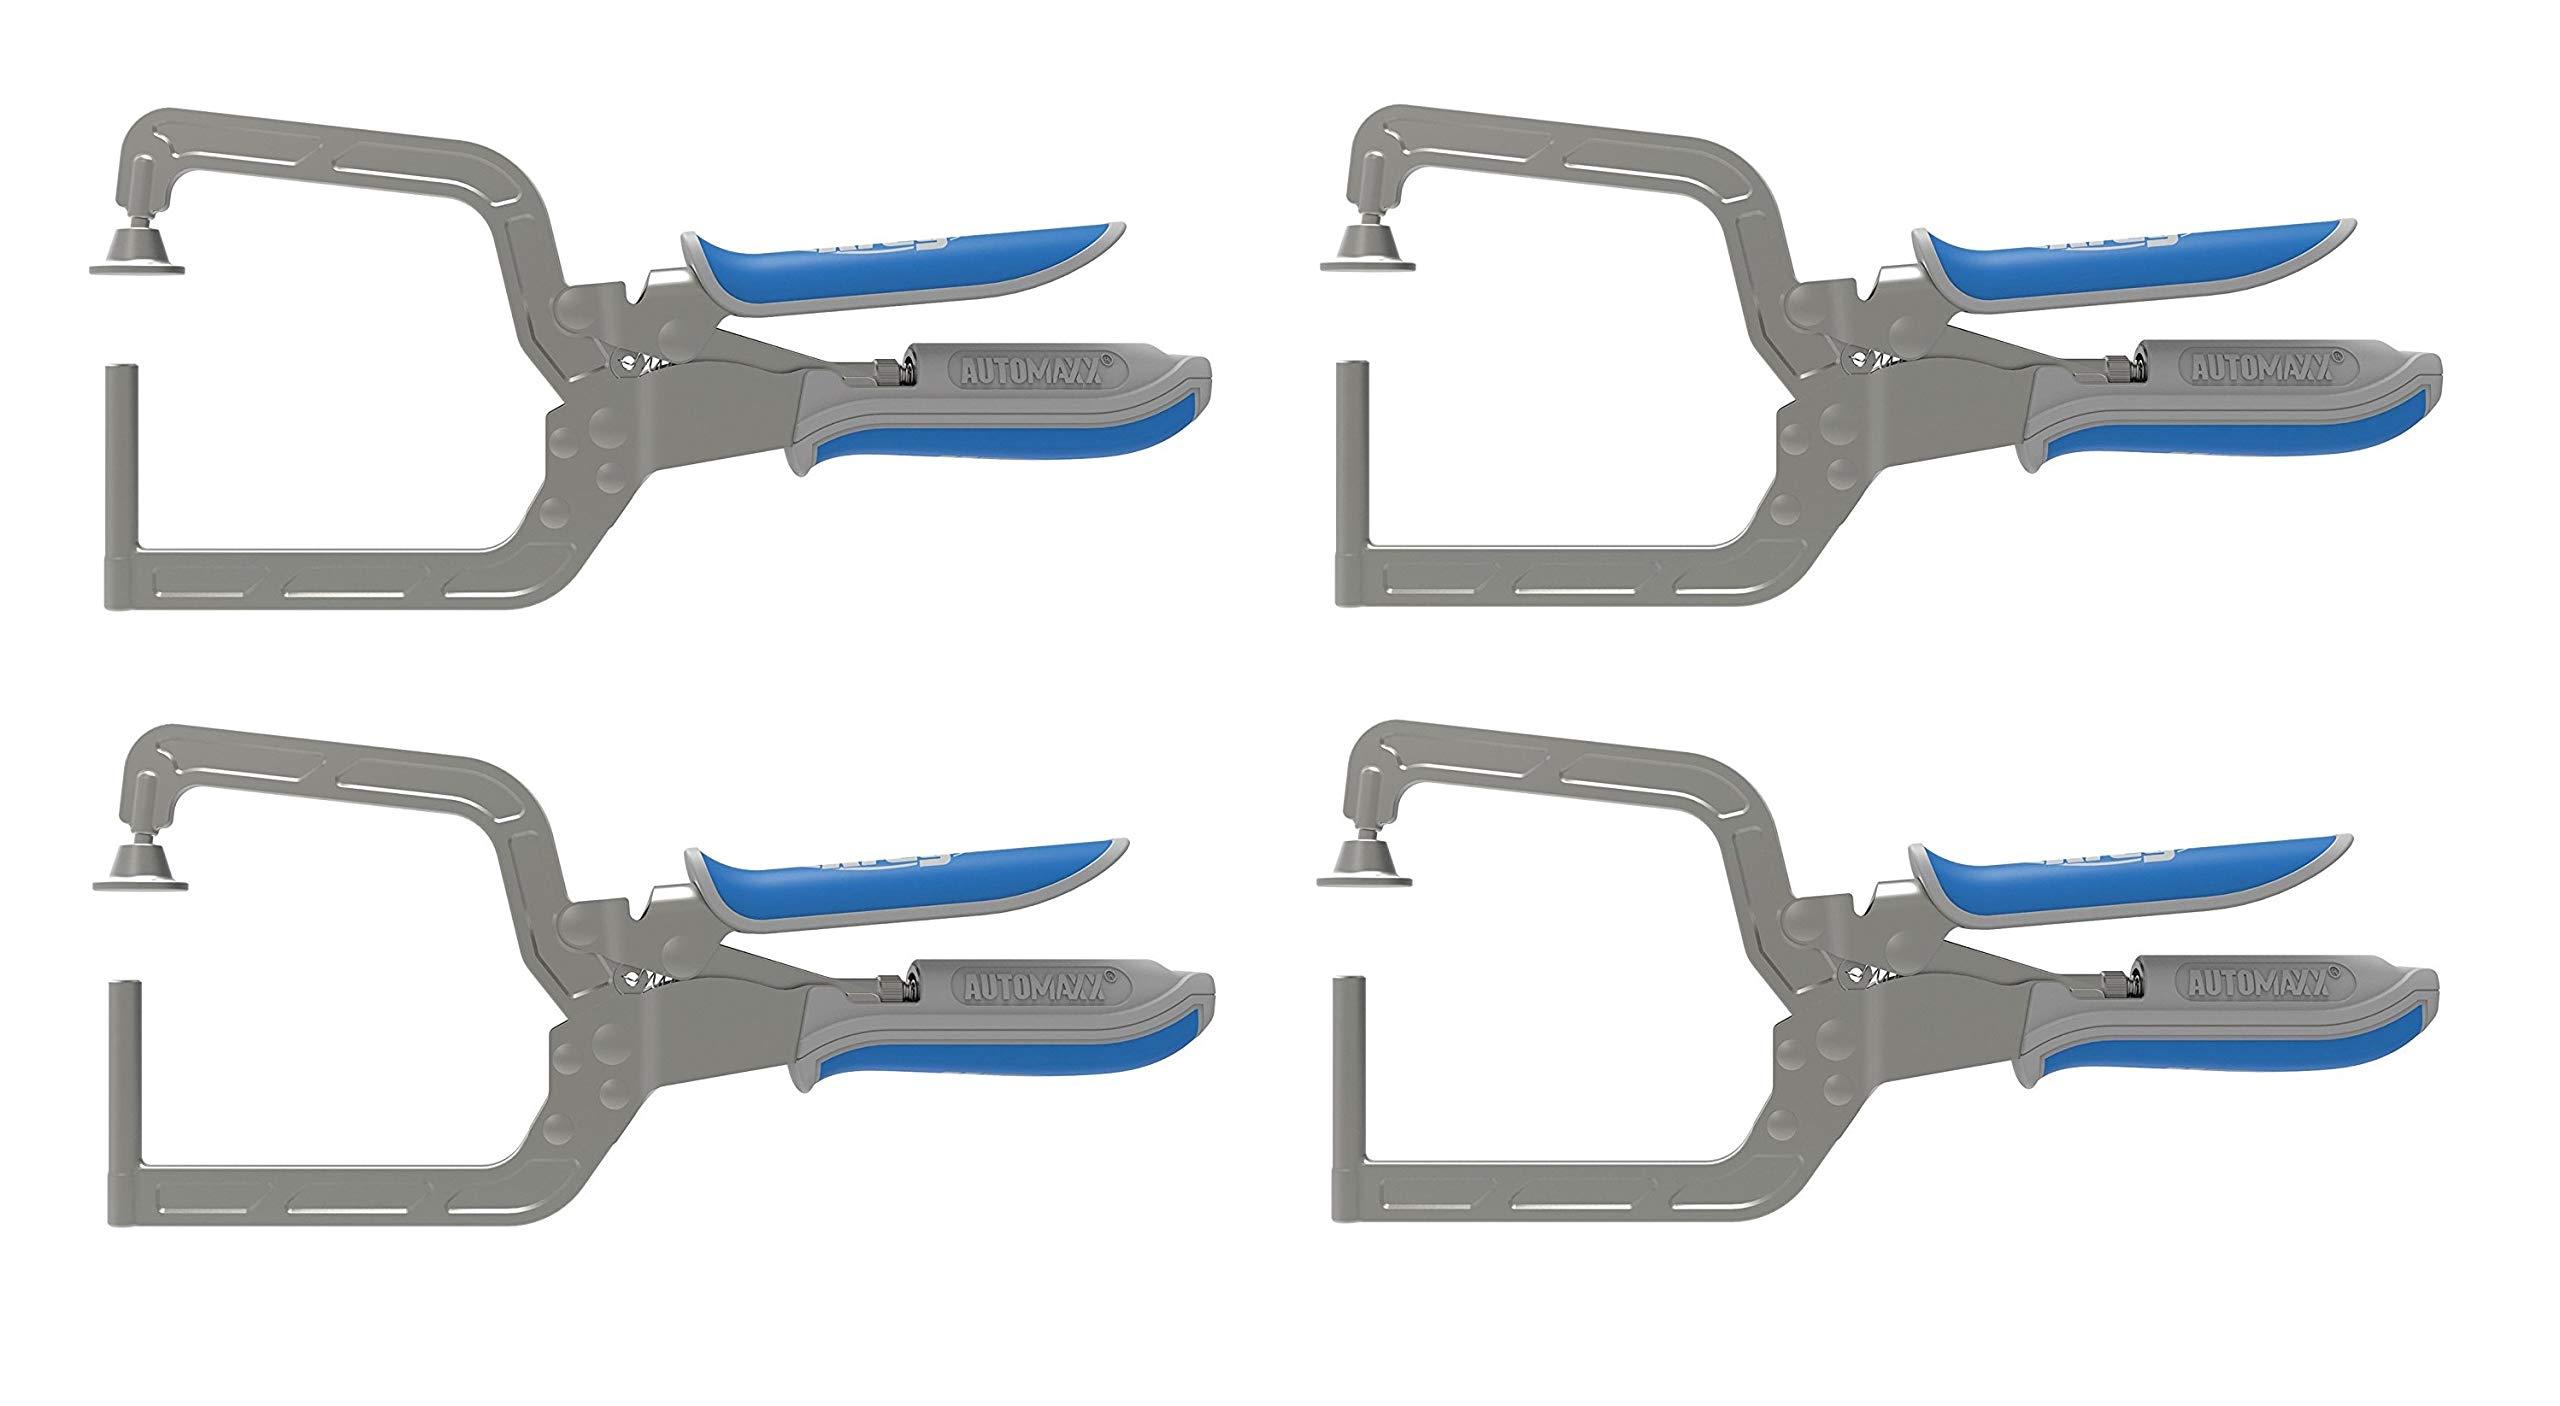 Kreg KHCRA Automaxx Right Angle Clamp, 4 Pack